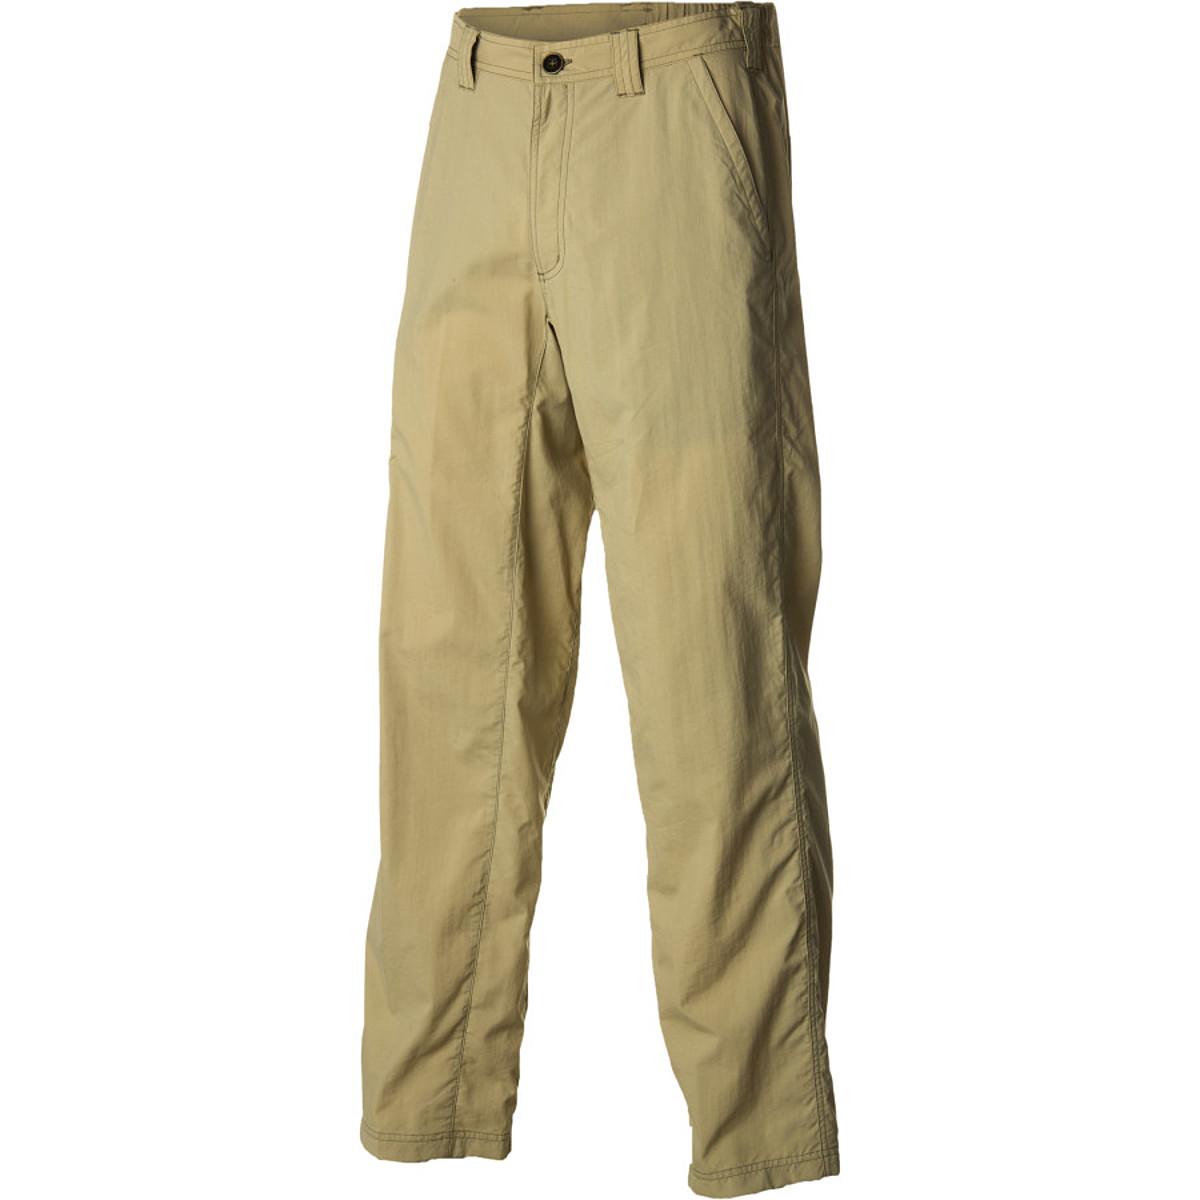 ExOfficio Nomad Pant